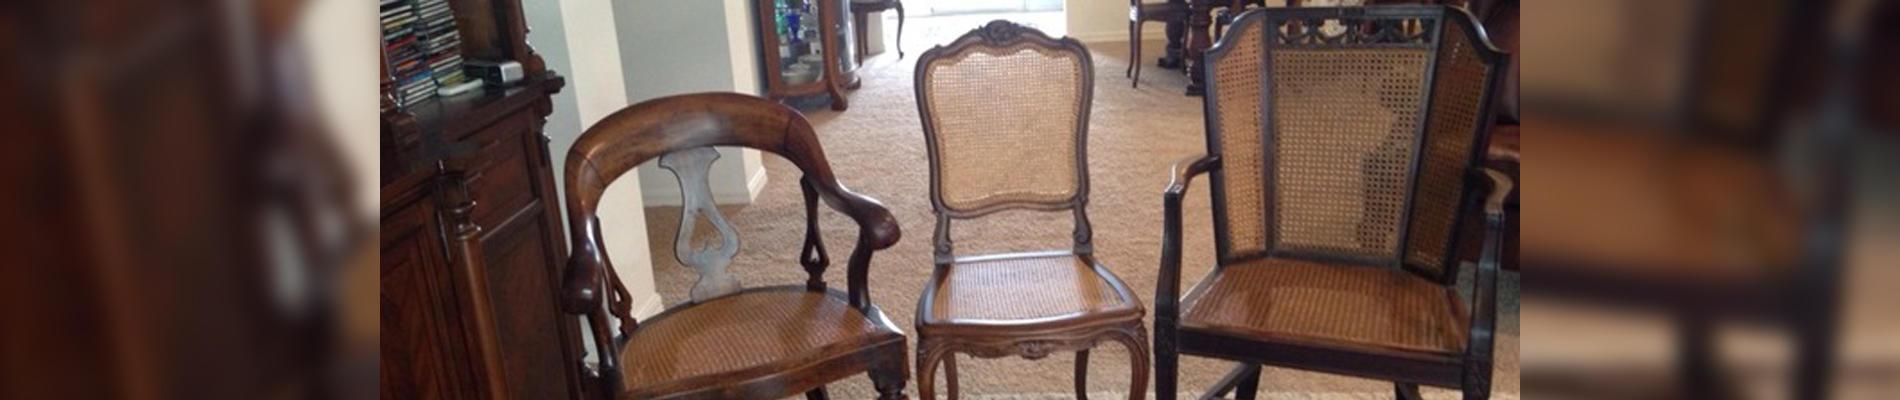 Veterans Chair Caning & Repair image 0